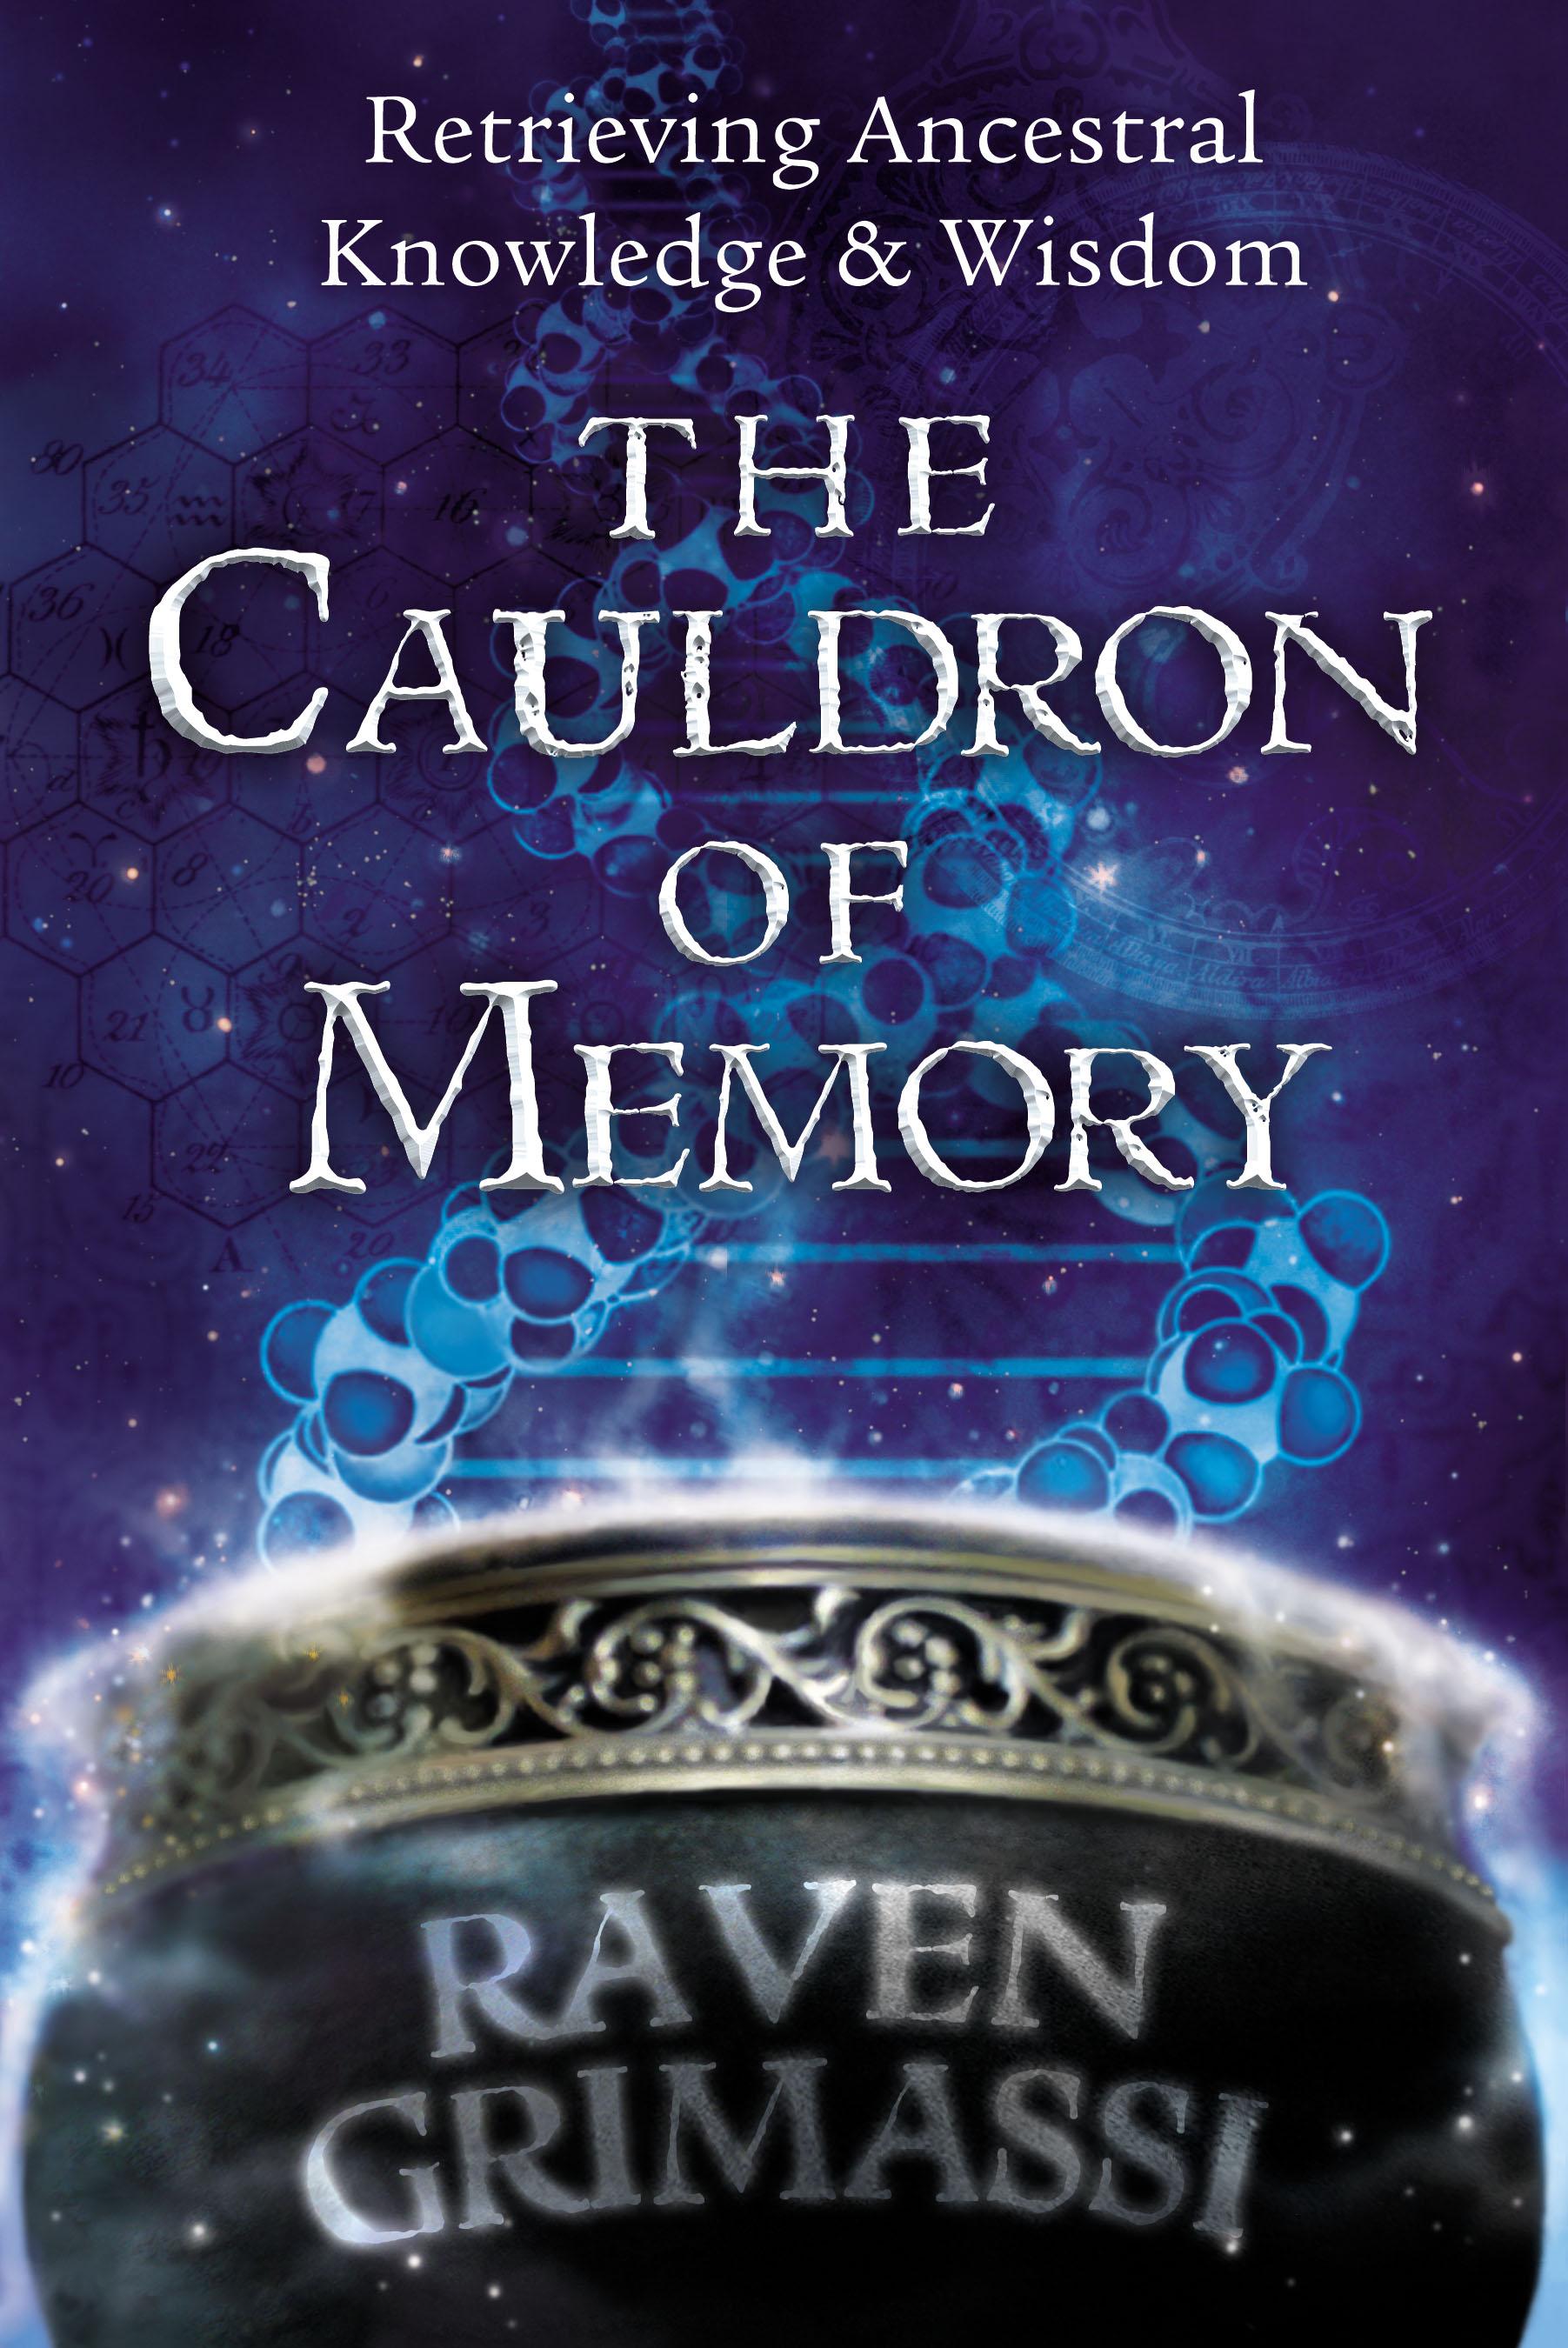 The Cauldron of Memory – Retrieving Ancestral Knowledge and Wisdom